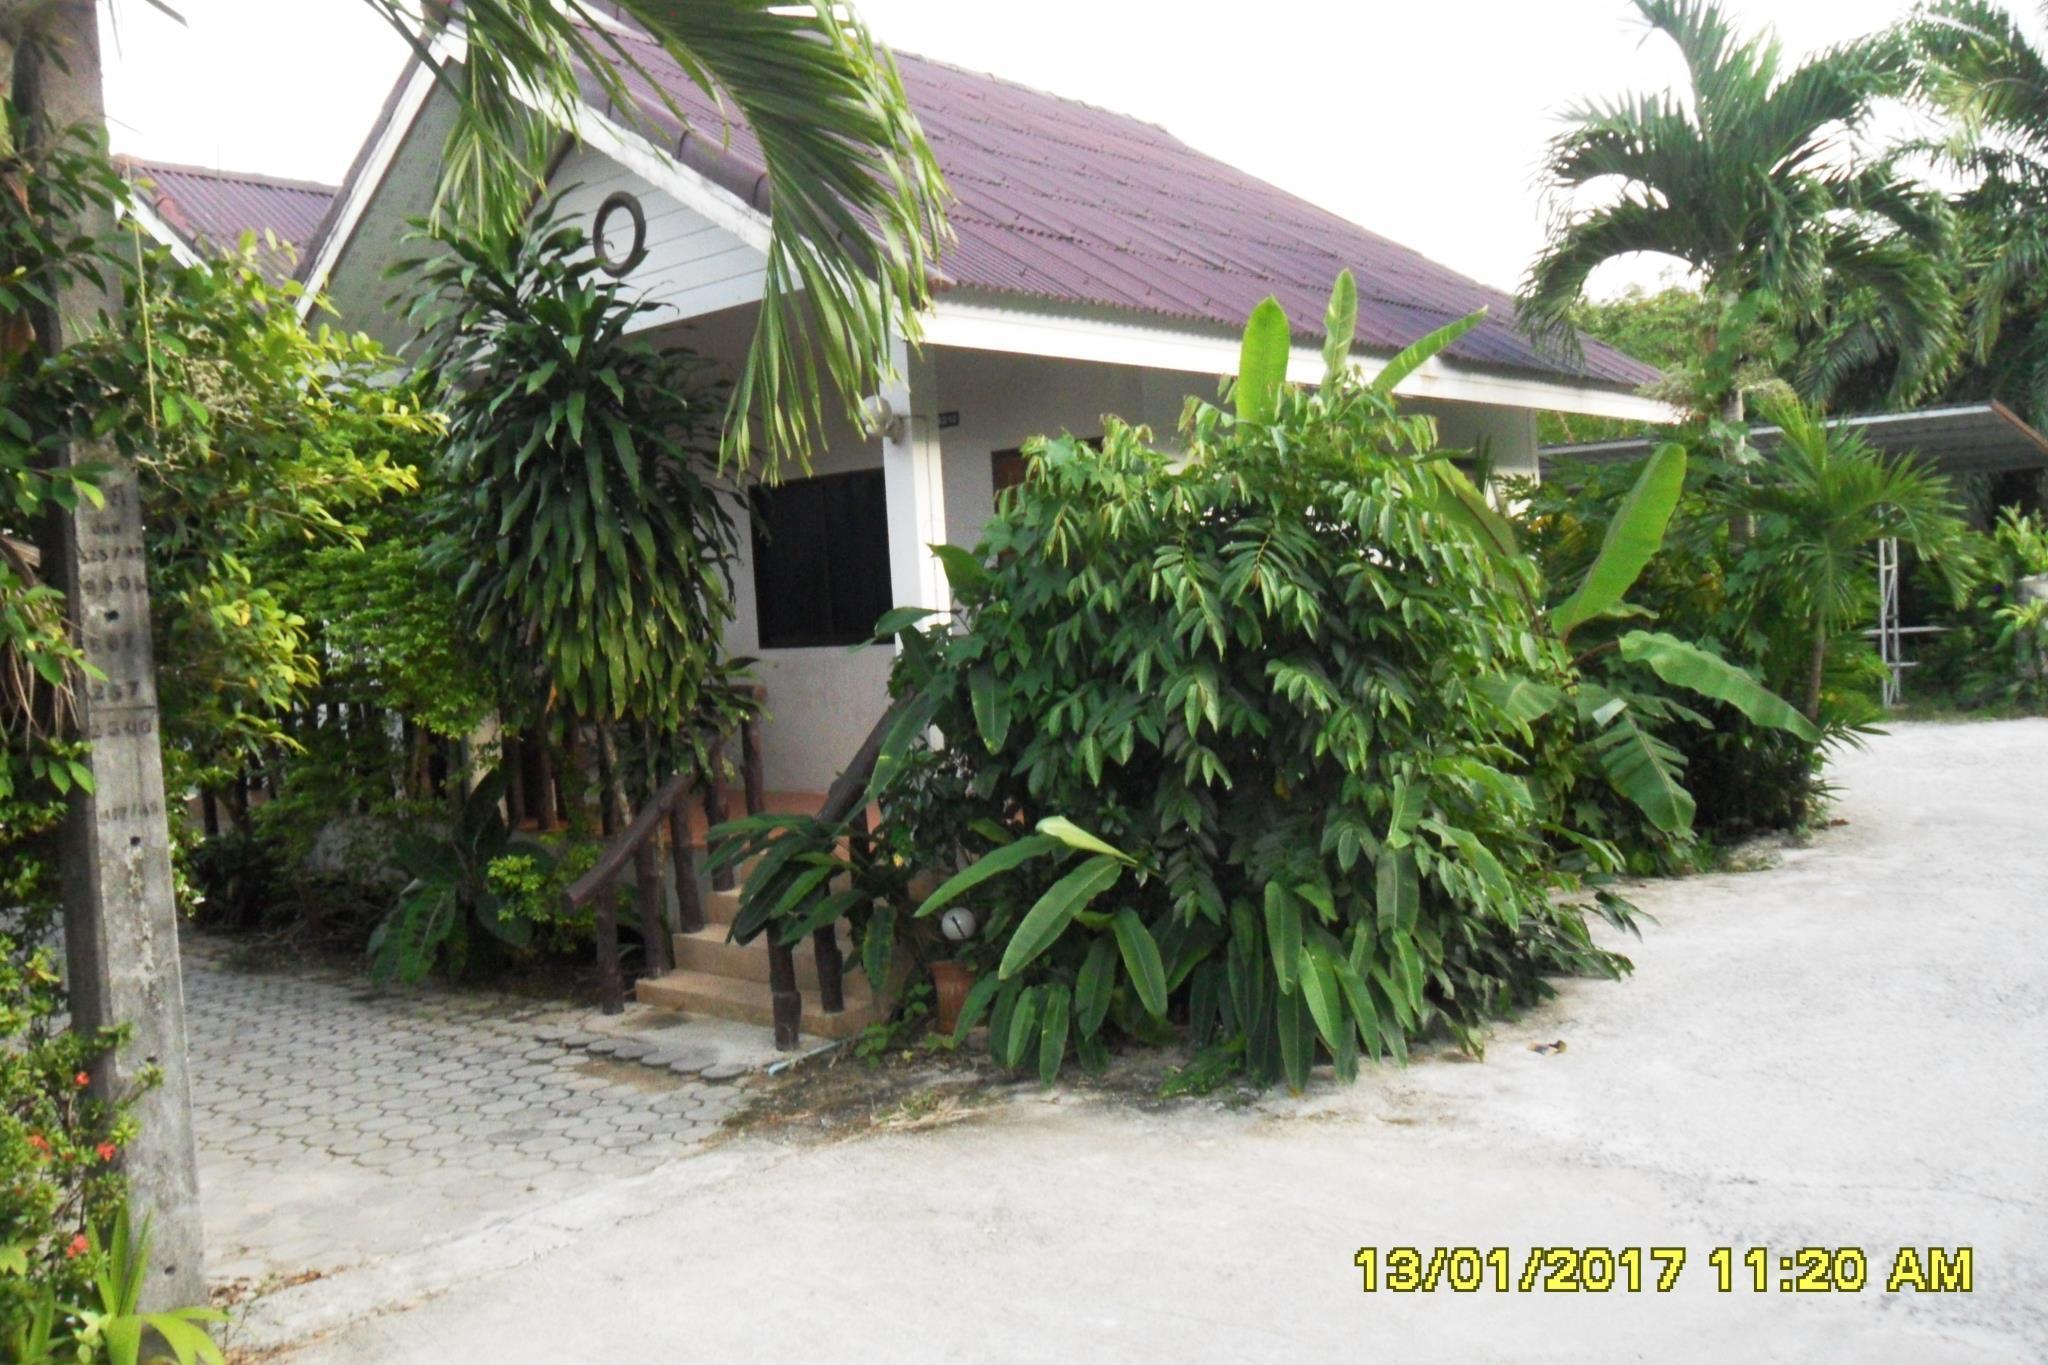 Aonang SR bungalow อ่างนาง เอสอาร์ วิว บังกาโล